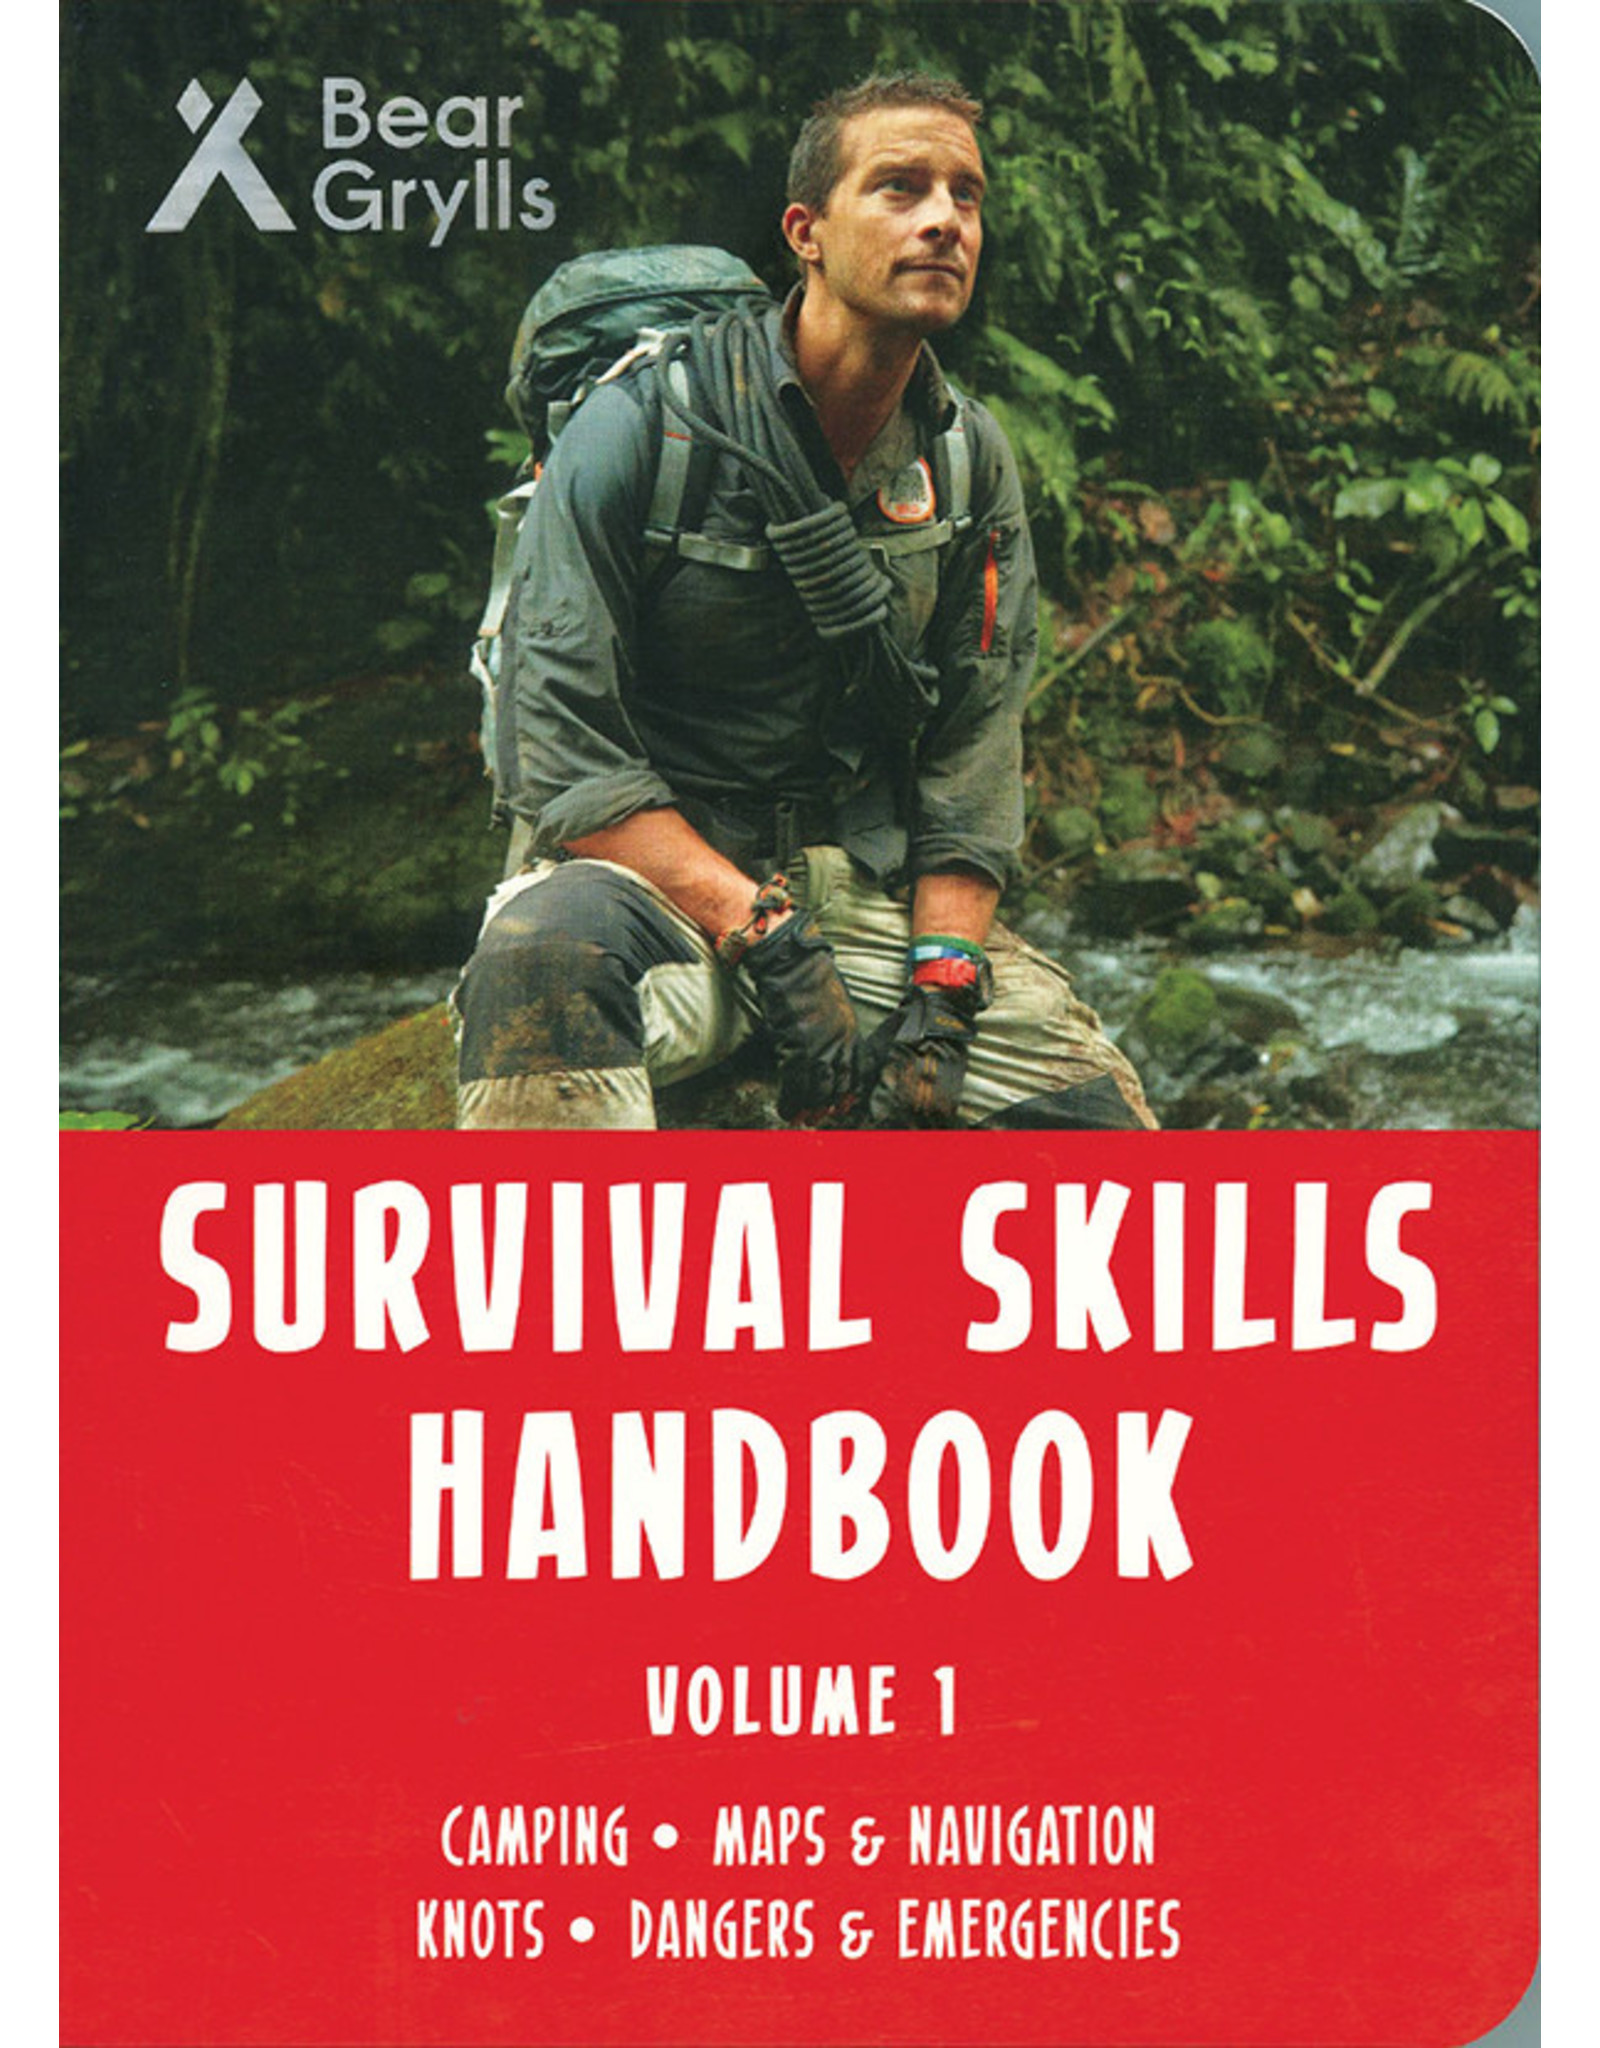 Usborne & Kane Miller Books Bear Grylls, Survival Skills Handbook Vol. 1